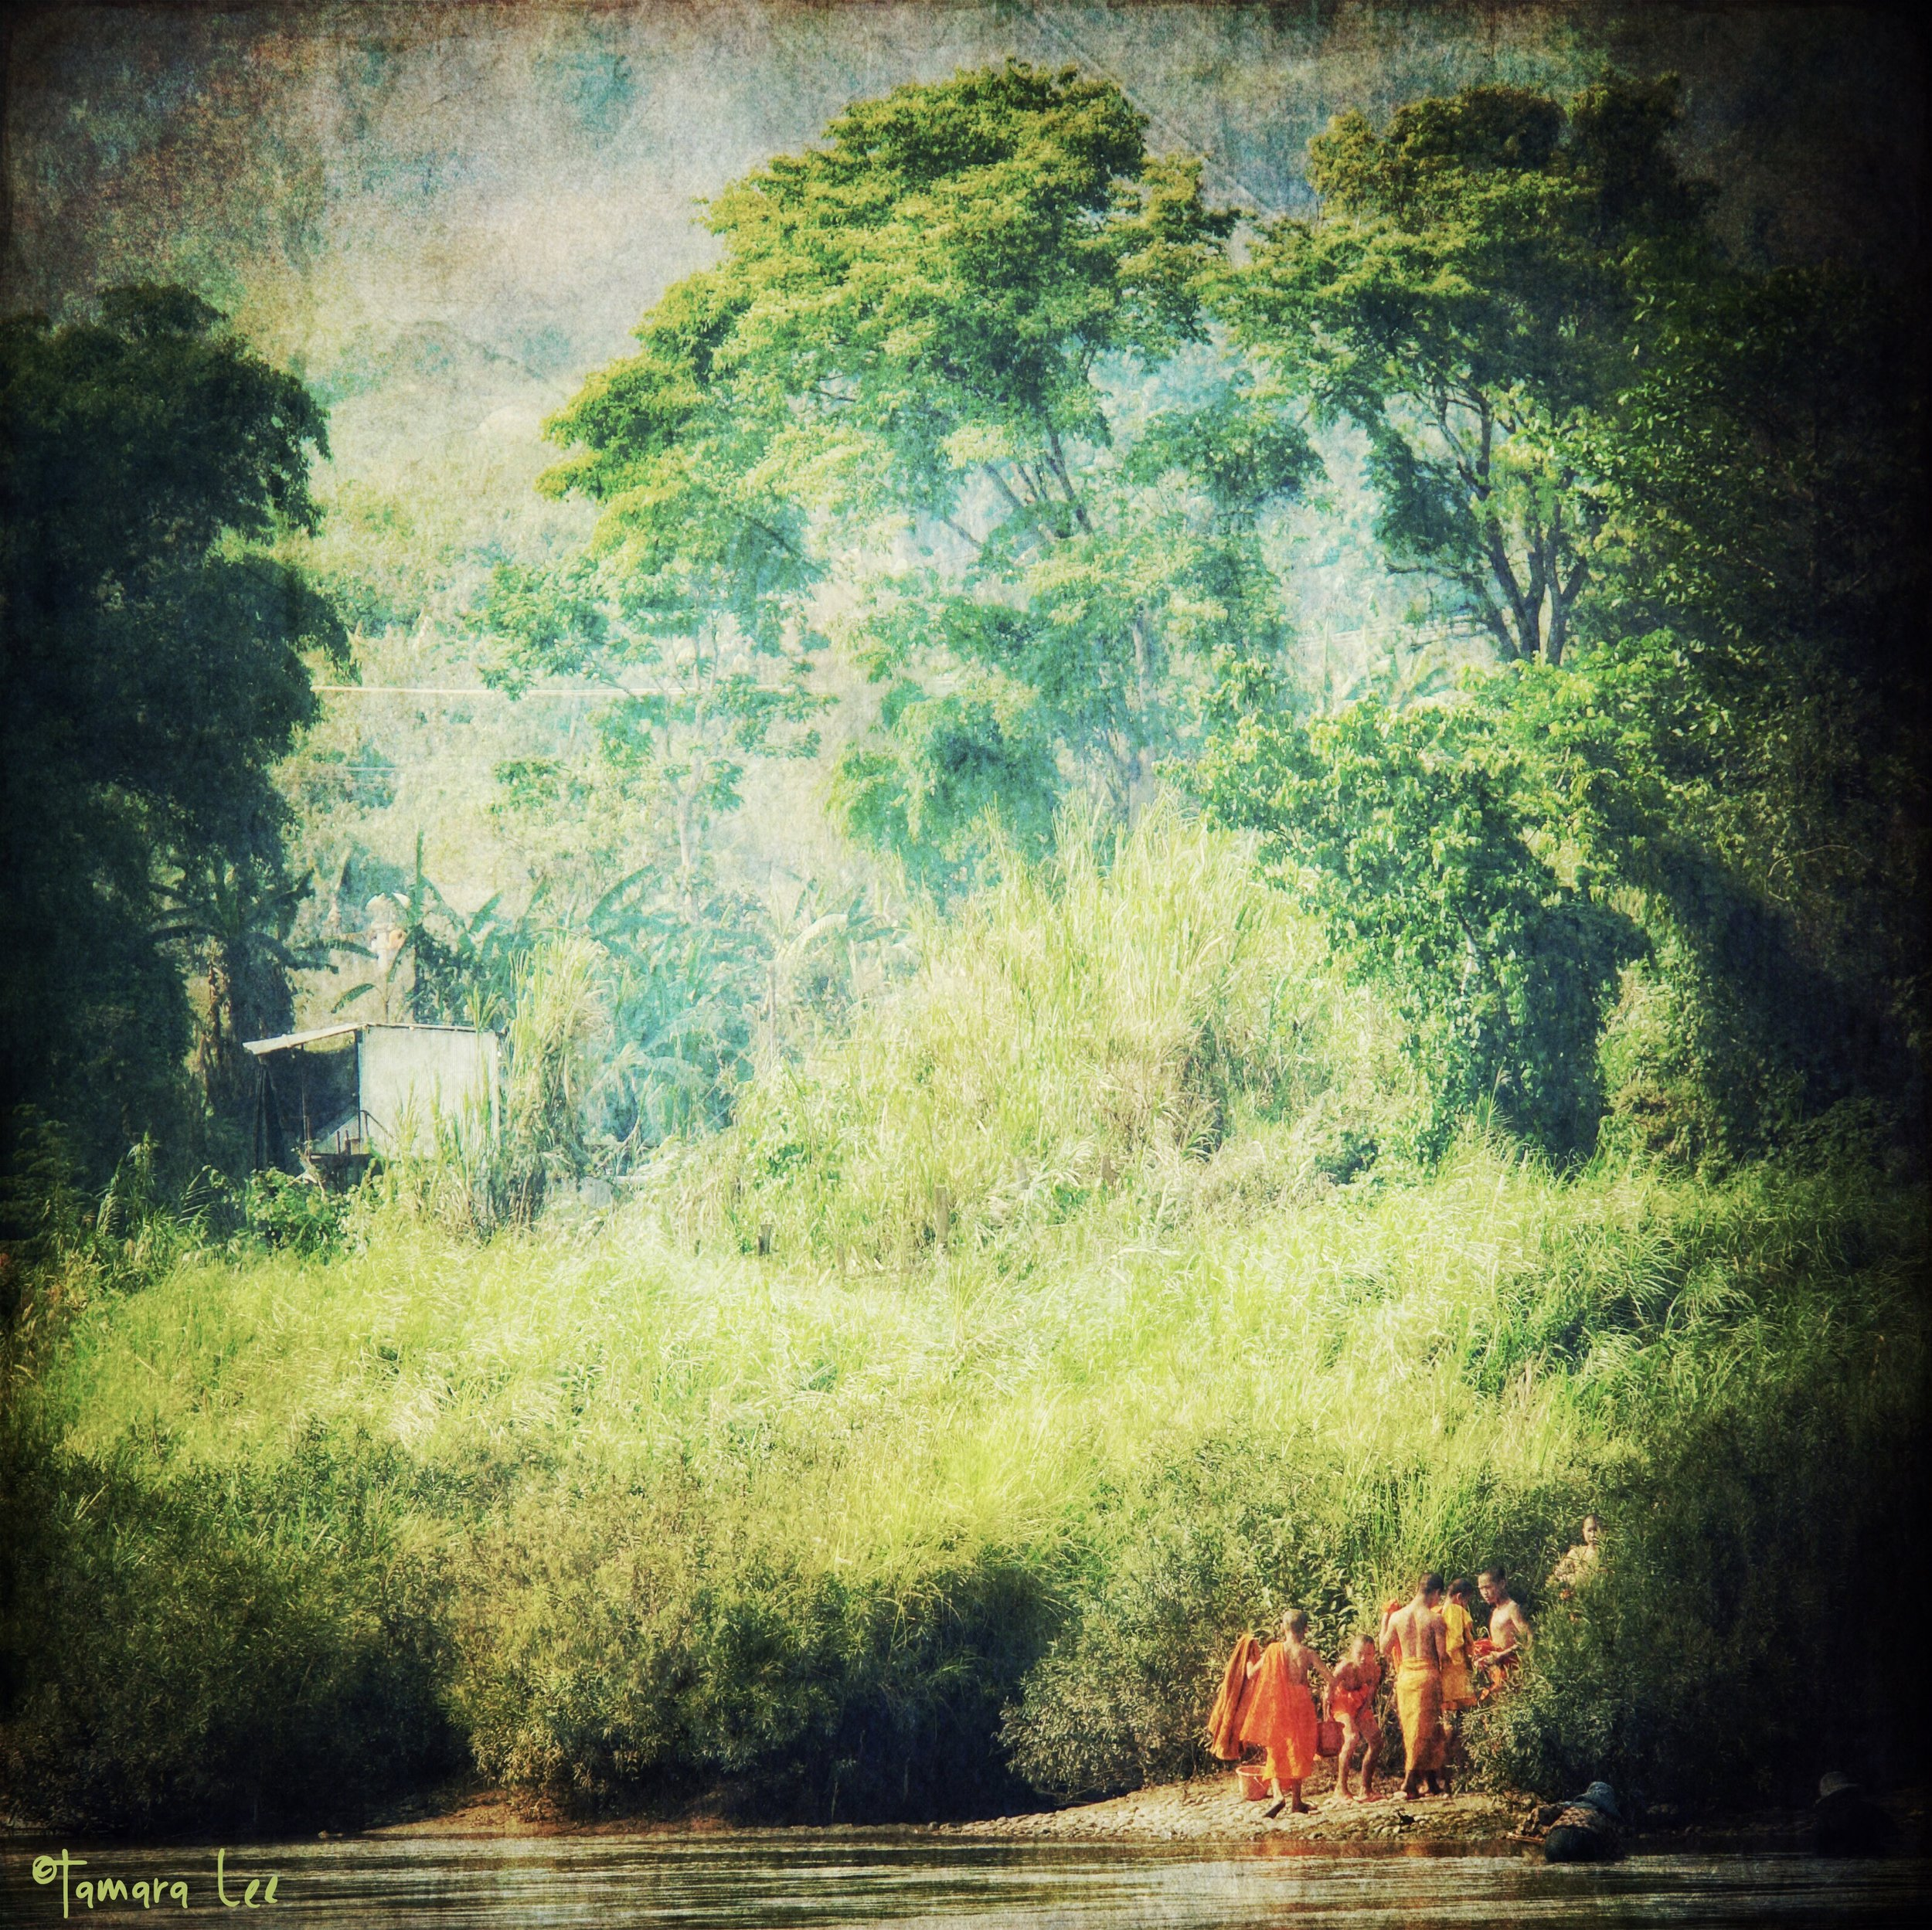 Mekong15.JPG